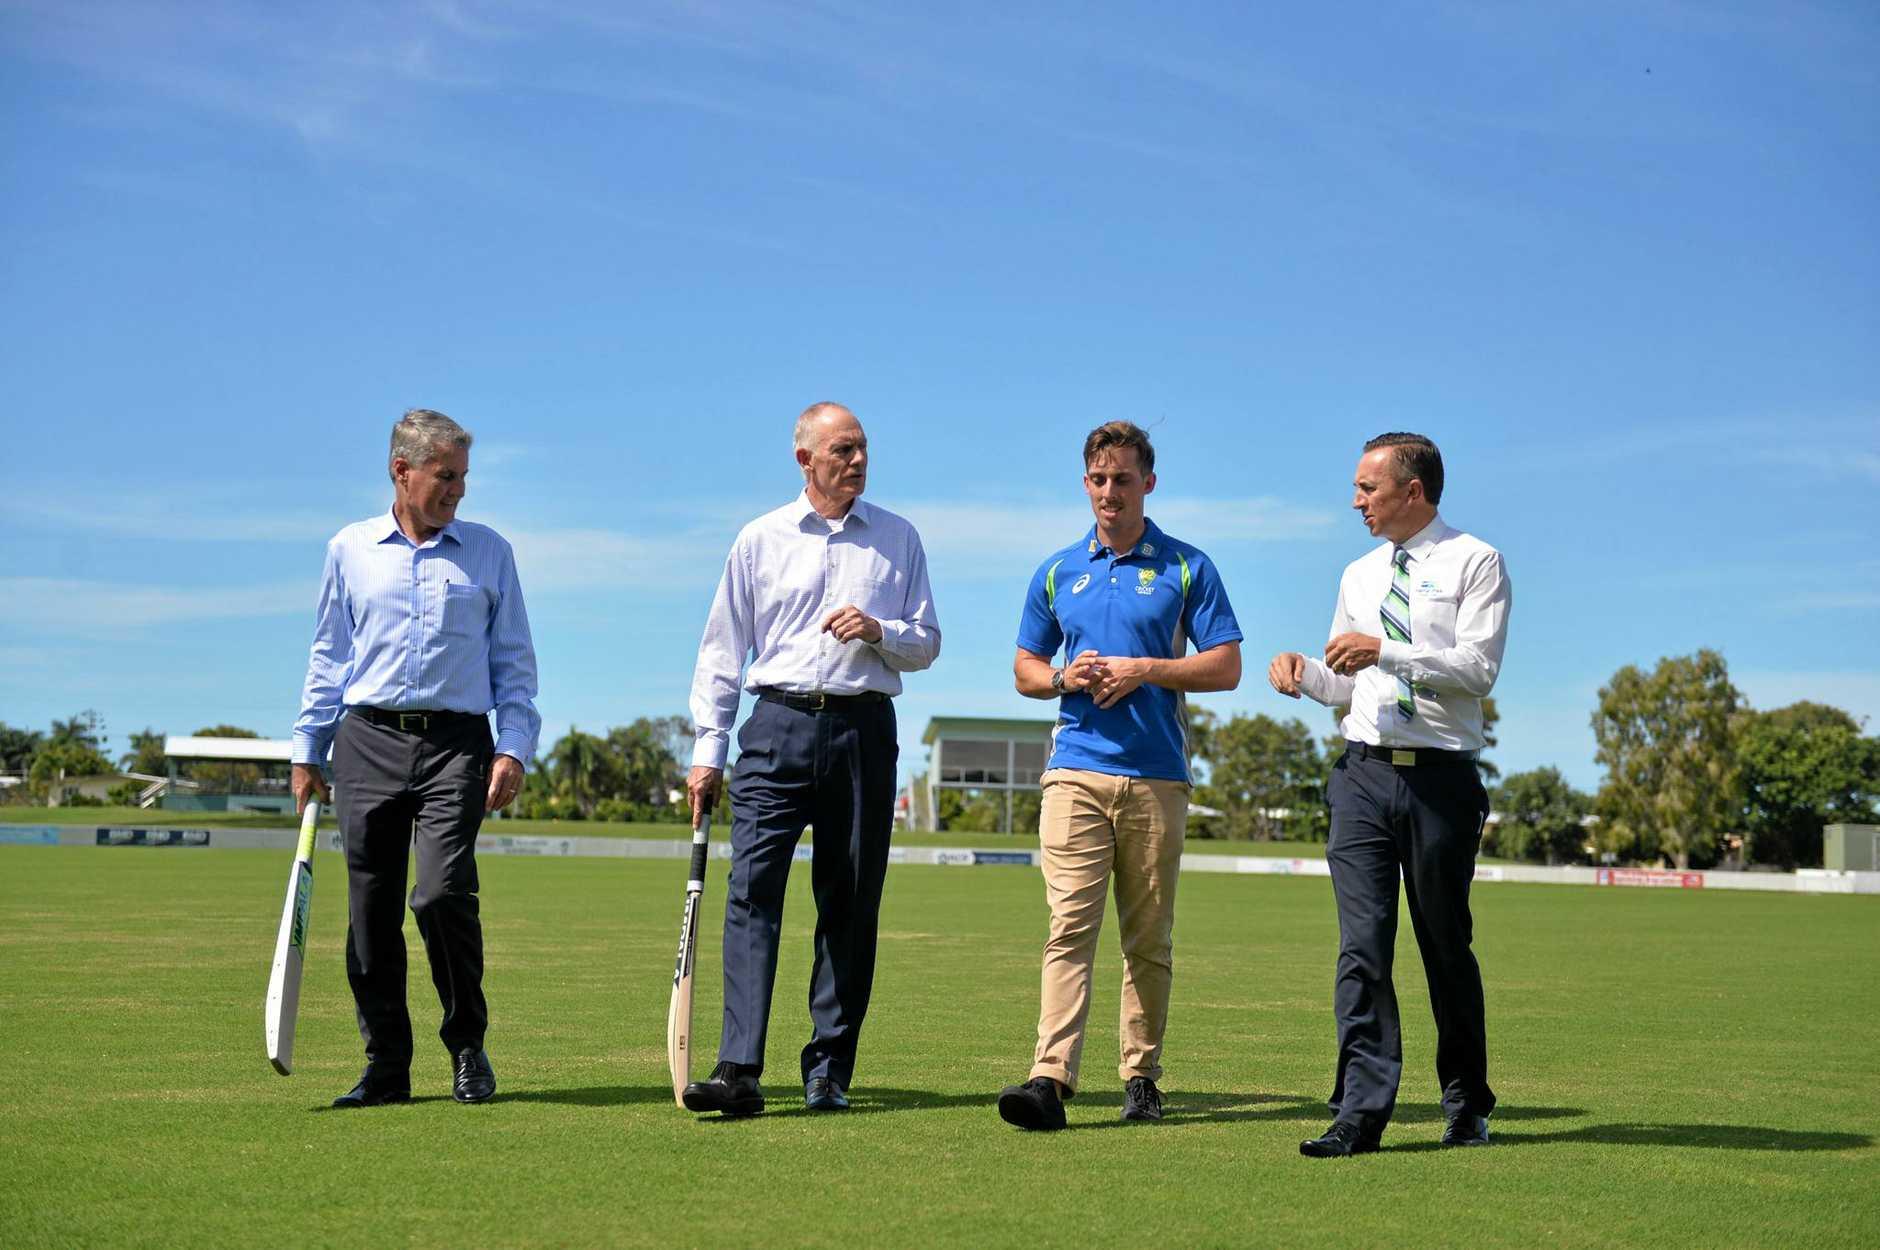 Mackay Mayor Greg Williamson, cricket legend Greg Chappell, Australia A bowler Jake Lehman and Harrup Park Country Club general manager Michael Jones announcing that Harrup Park would host the Quadrangluar A Series last year.